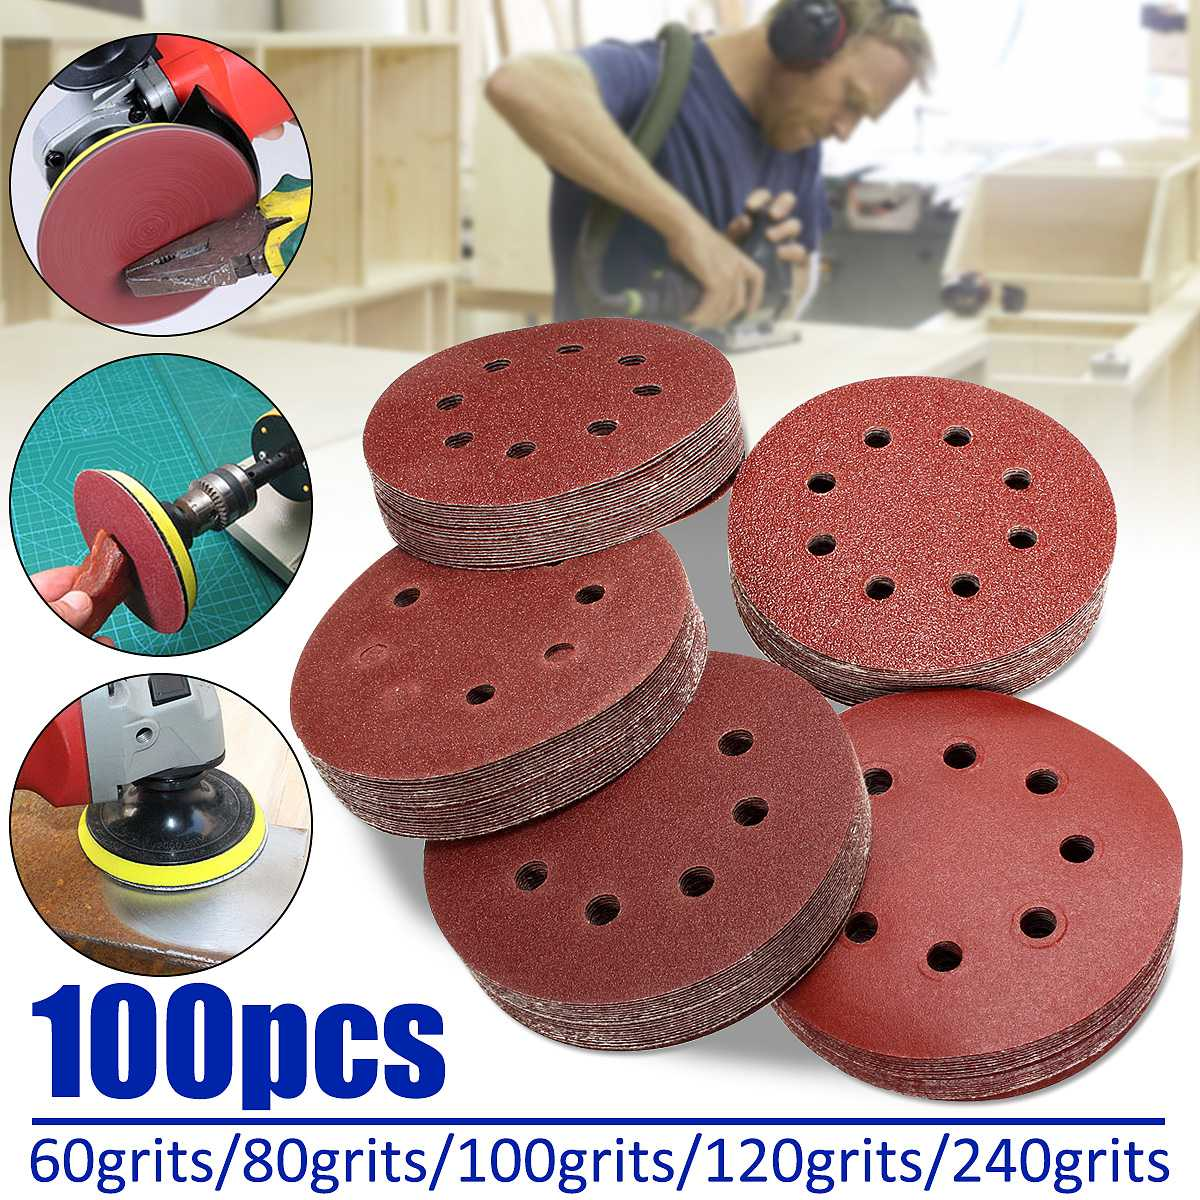 100pcs 125mm/5'' Orbit Sanding Polishing Sheet Sandpaper Round Shape Sander Discs Mixed 60/80/100/120/240 Grit Polish Pad